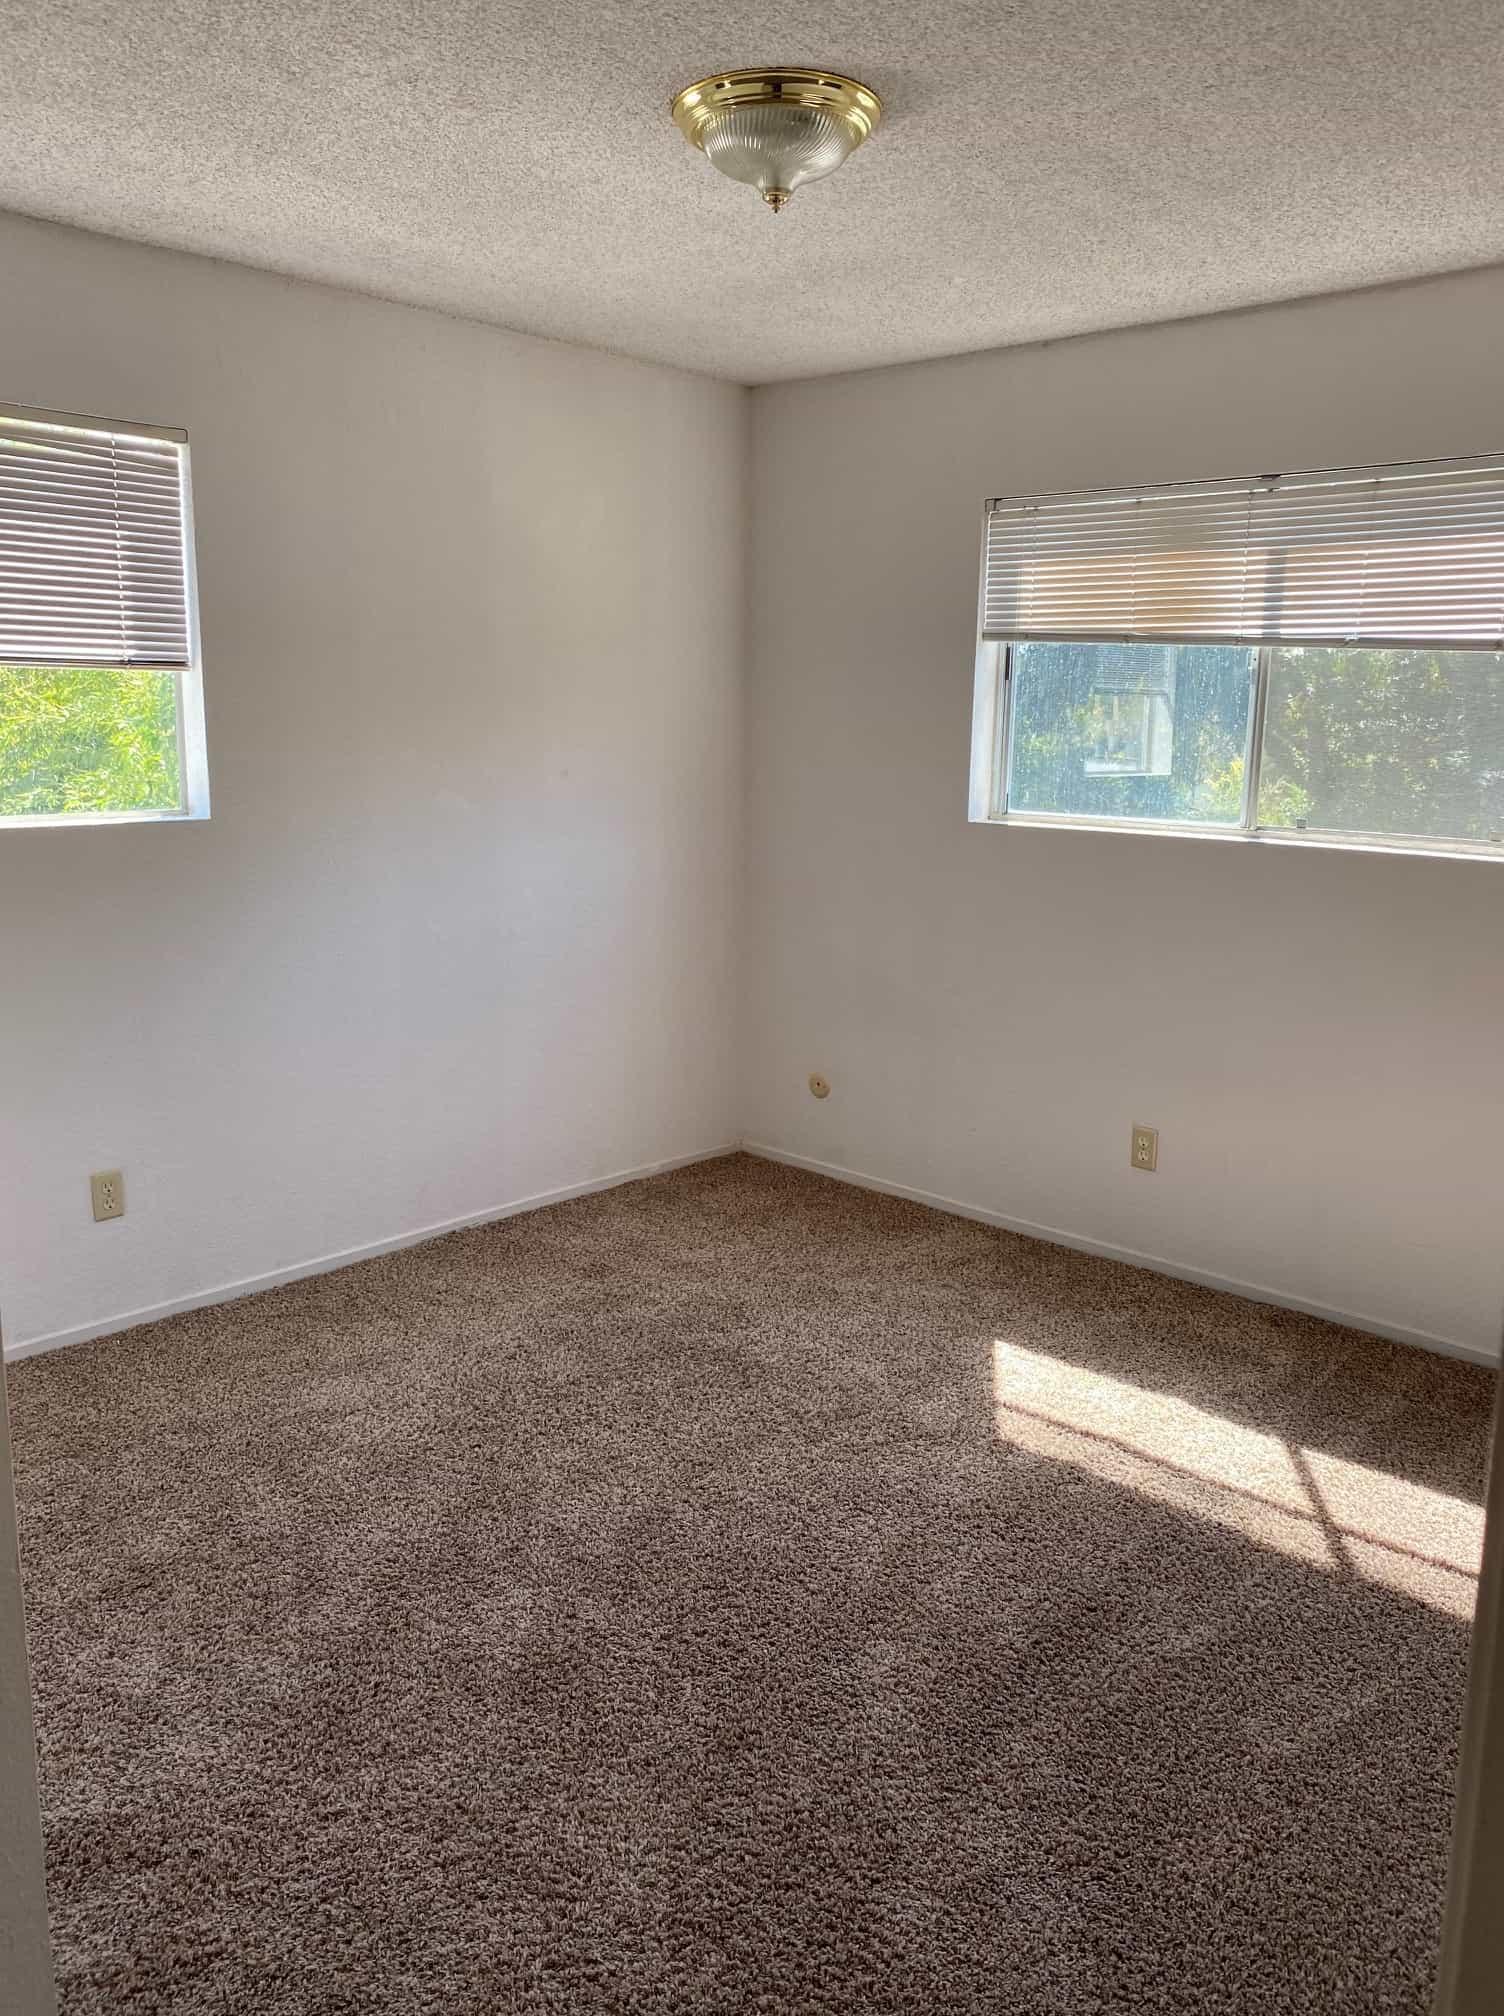 2801 Johnson #2 Left bedroom